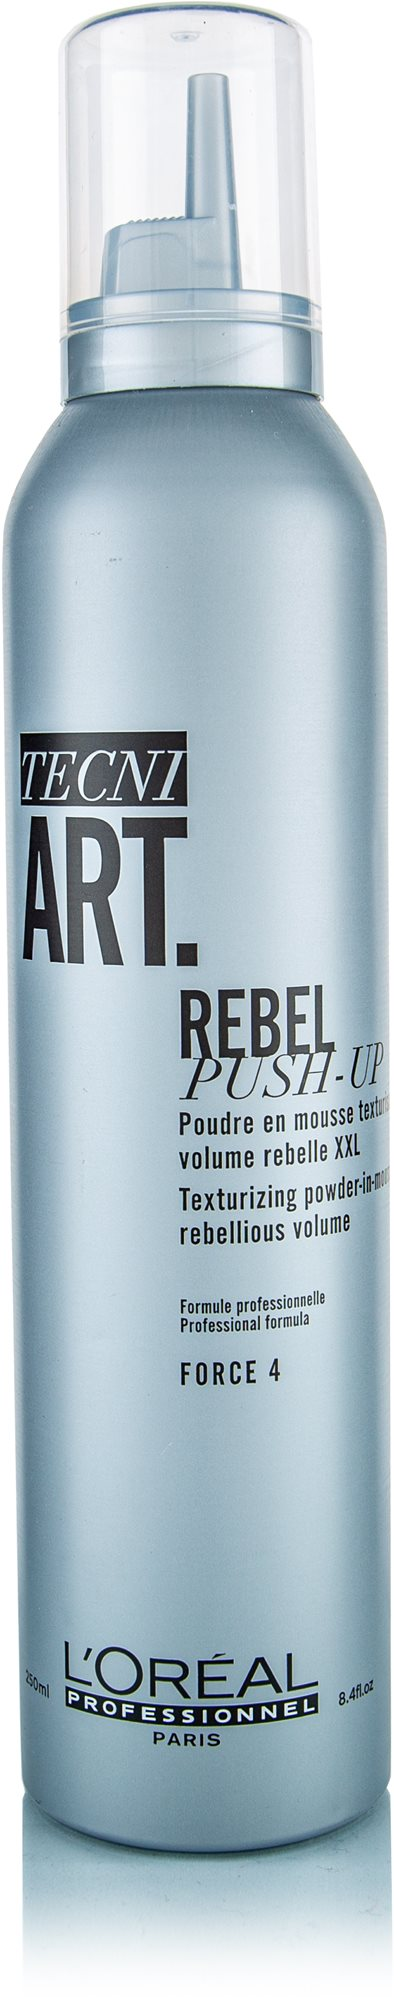 ĽORÉAL PROFESSIONNEL Tecni.Art Rebel Push-Up 250 ml